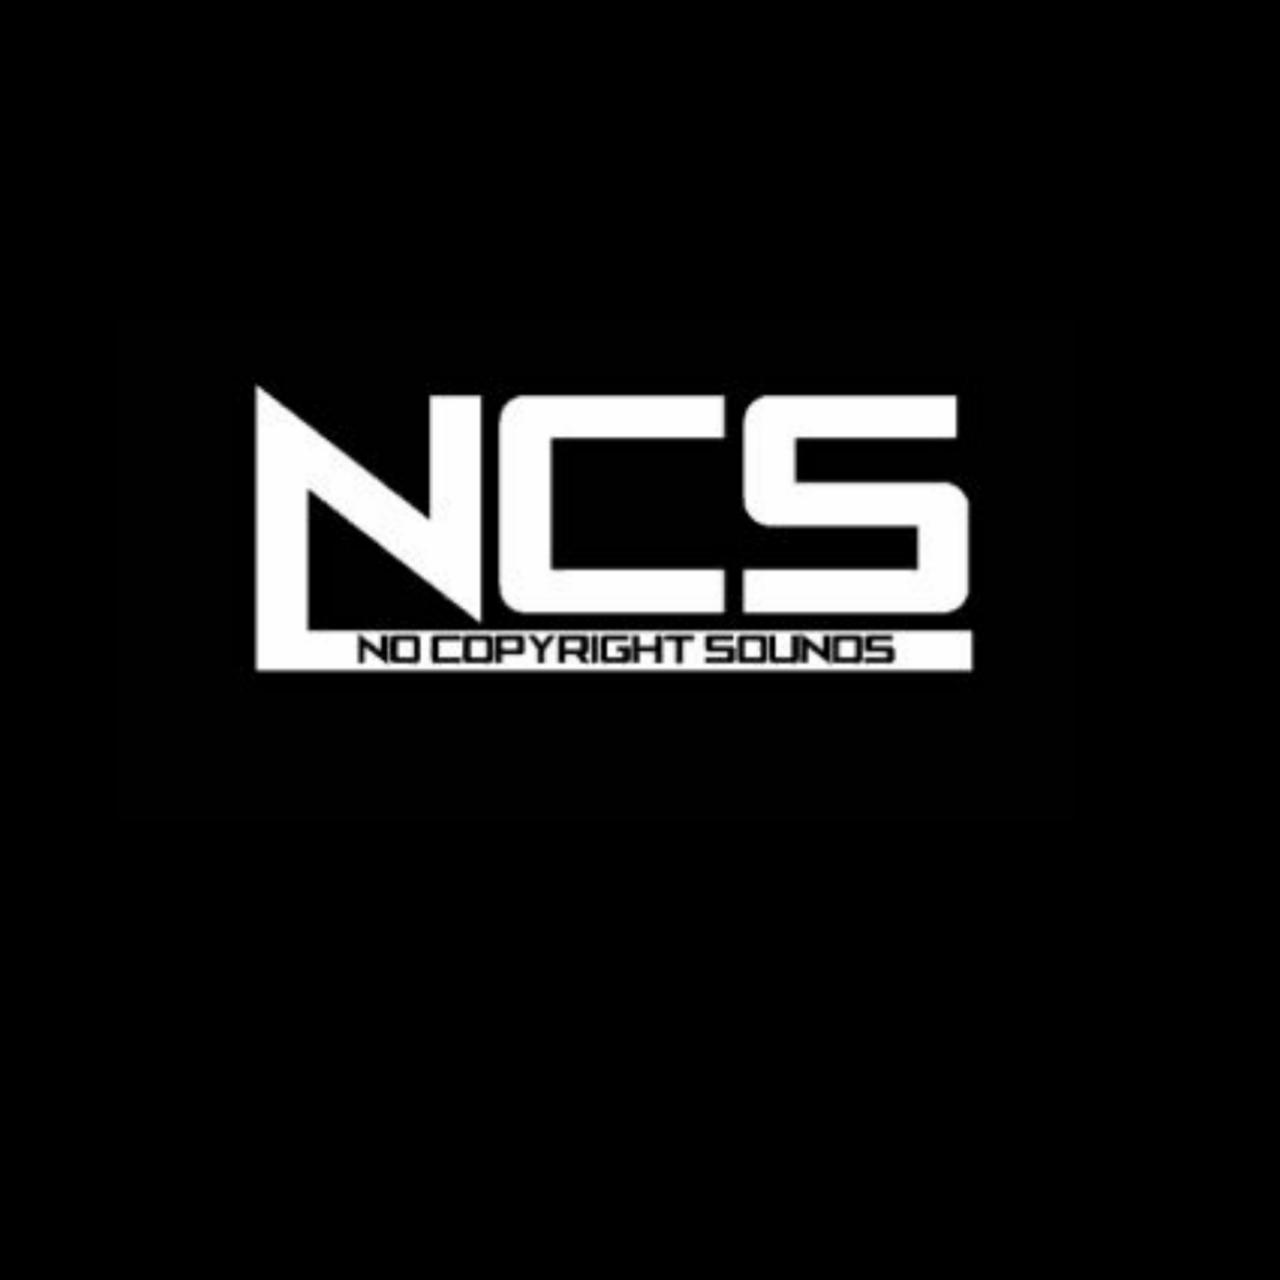 NCS Spectrum & Ncs Logo.